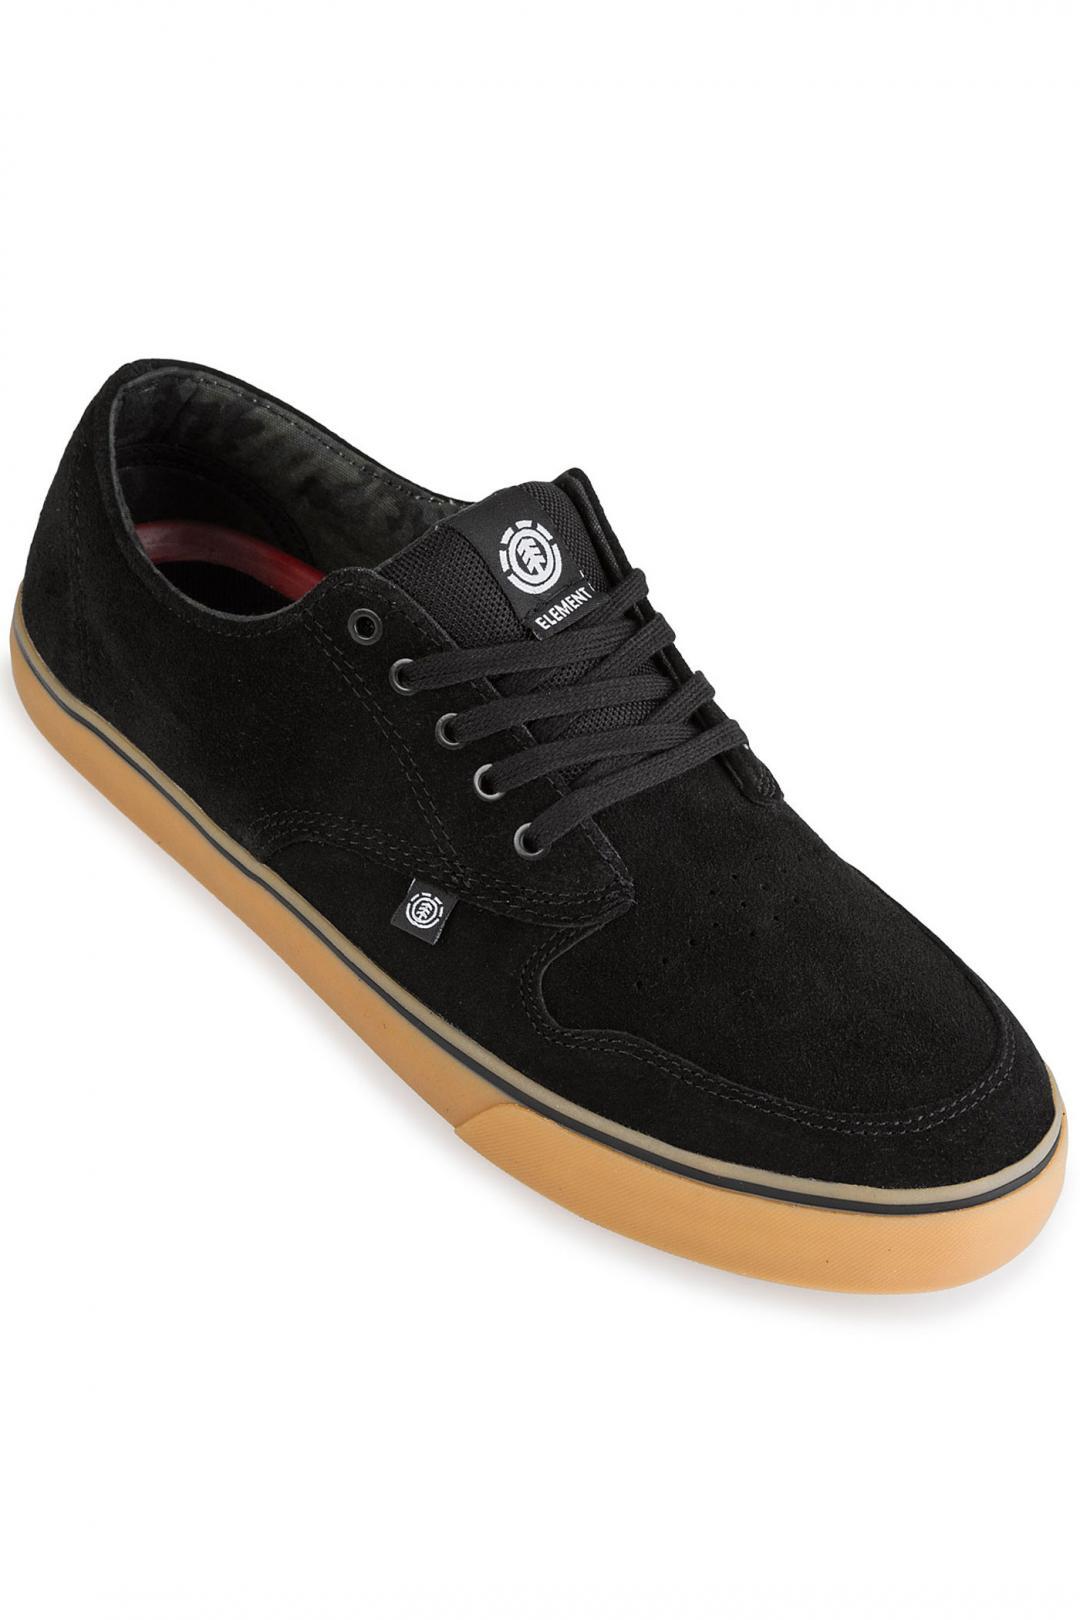 Uomo Element Topaz C3 black gum 2 | Sneakers low top